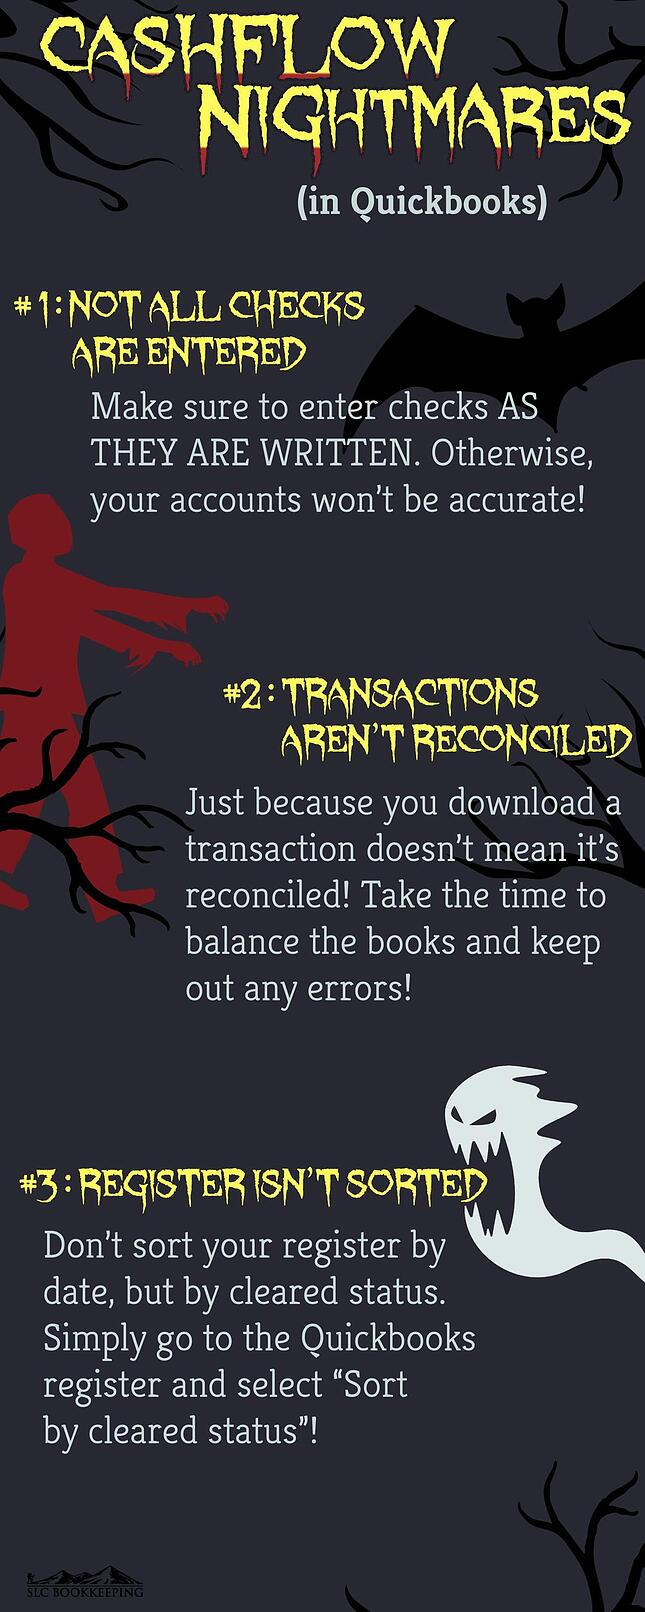 3_Quickbooks_Nightmares_1.jpg